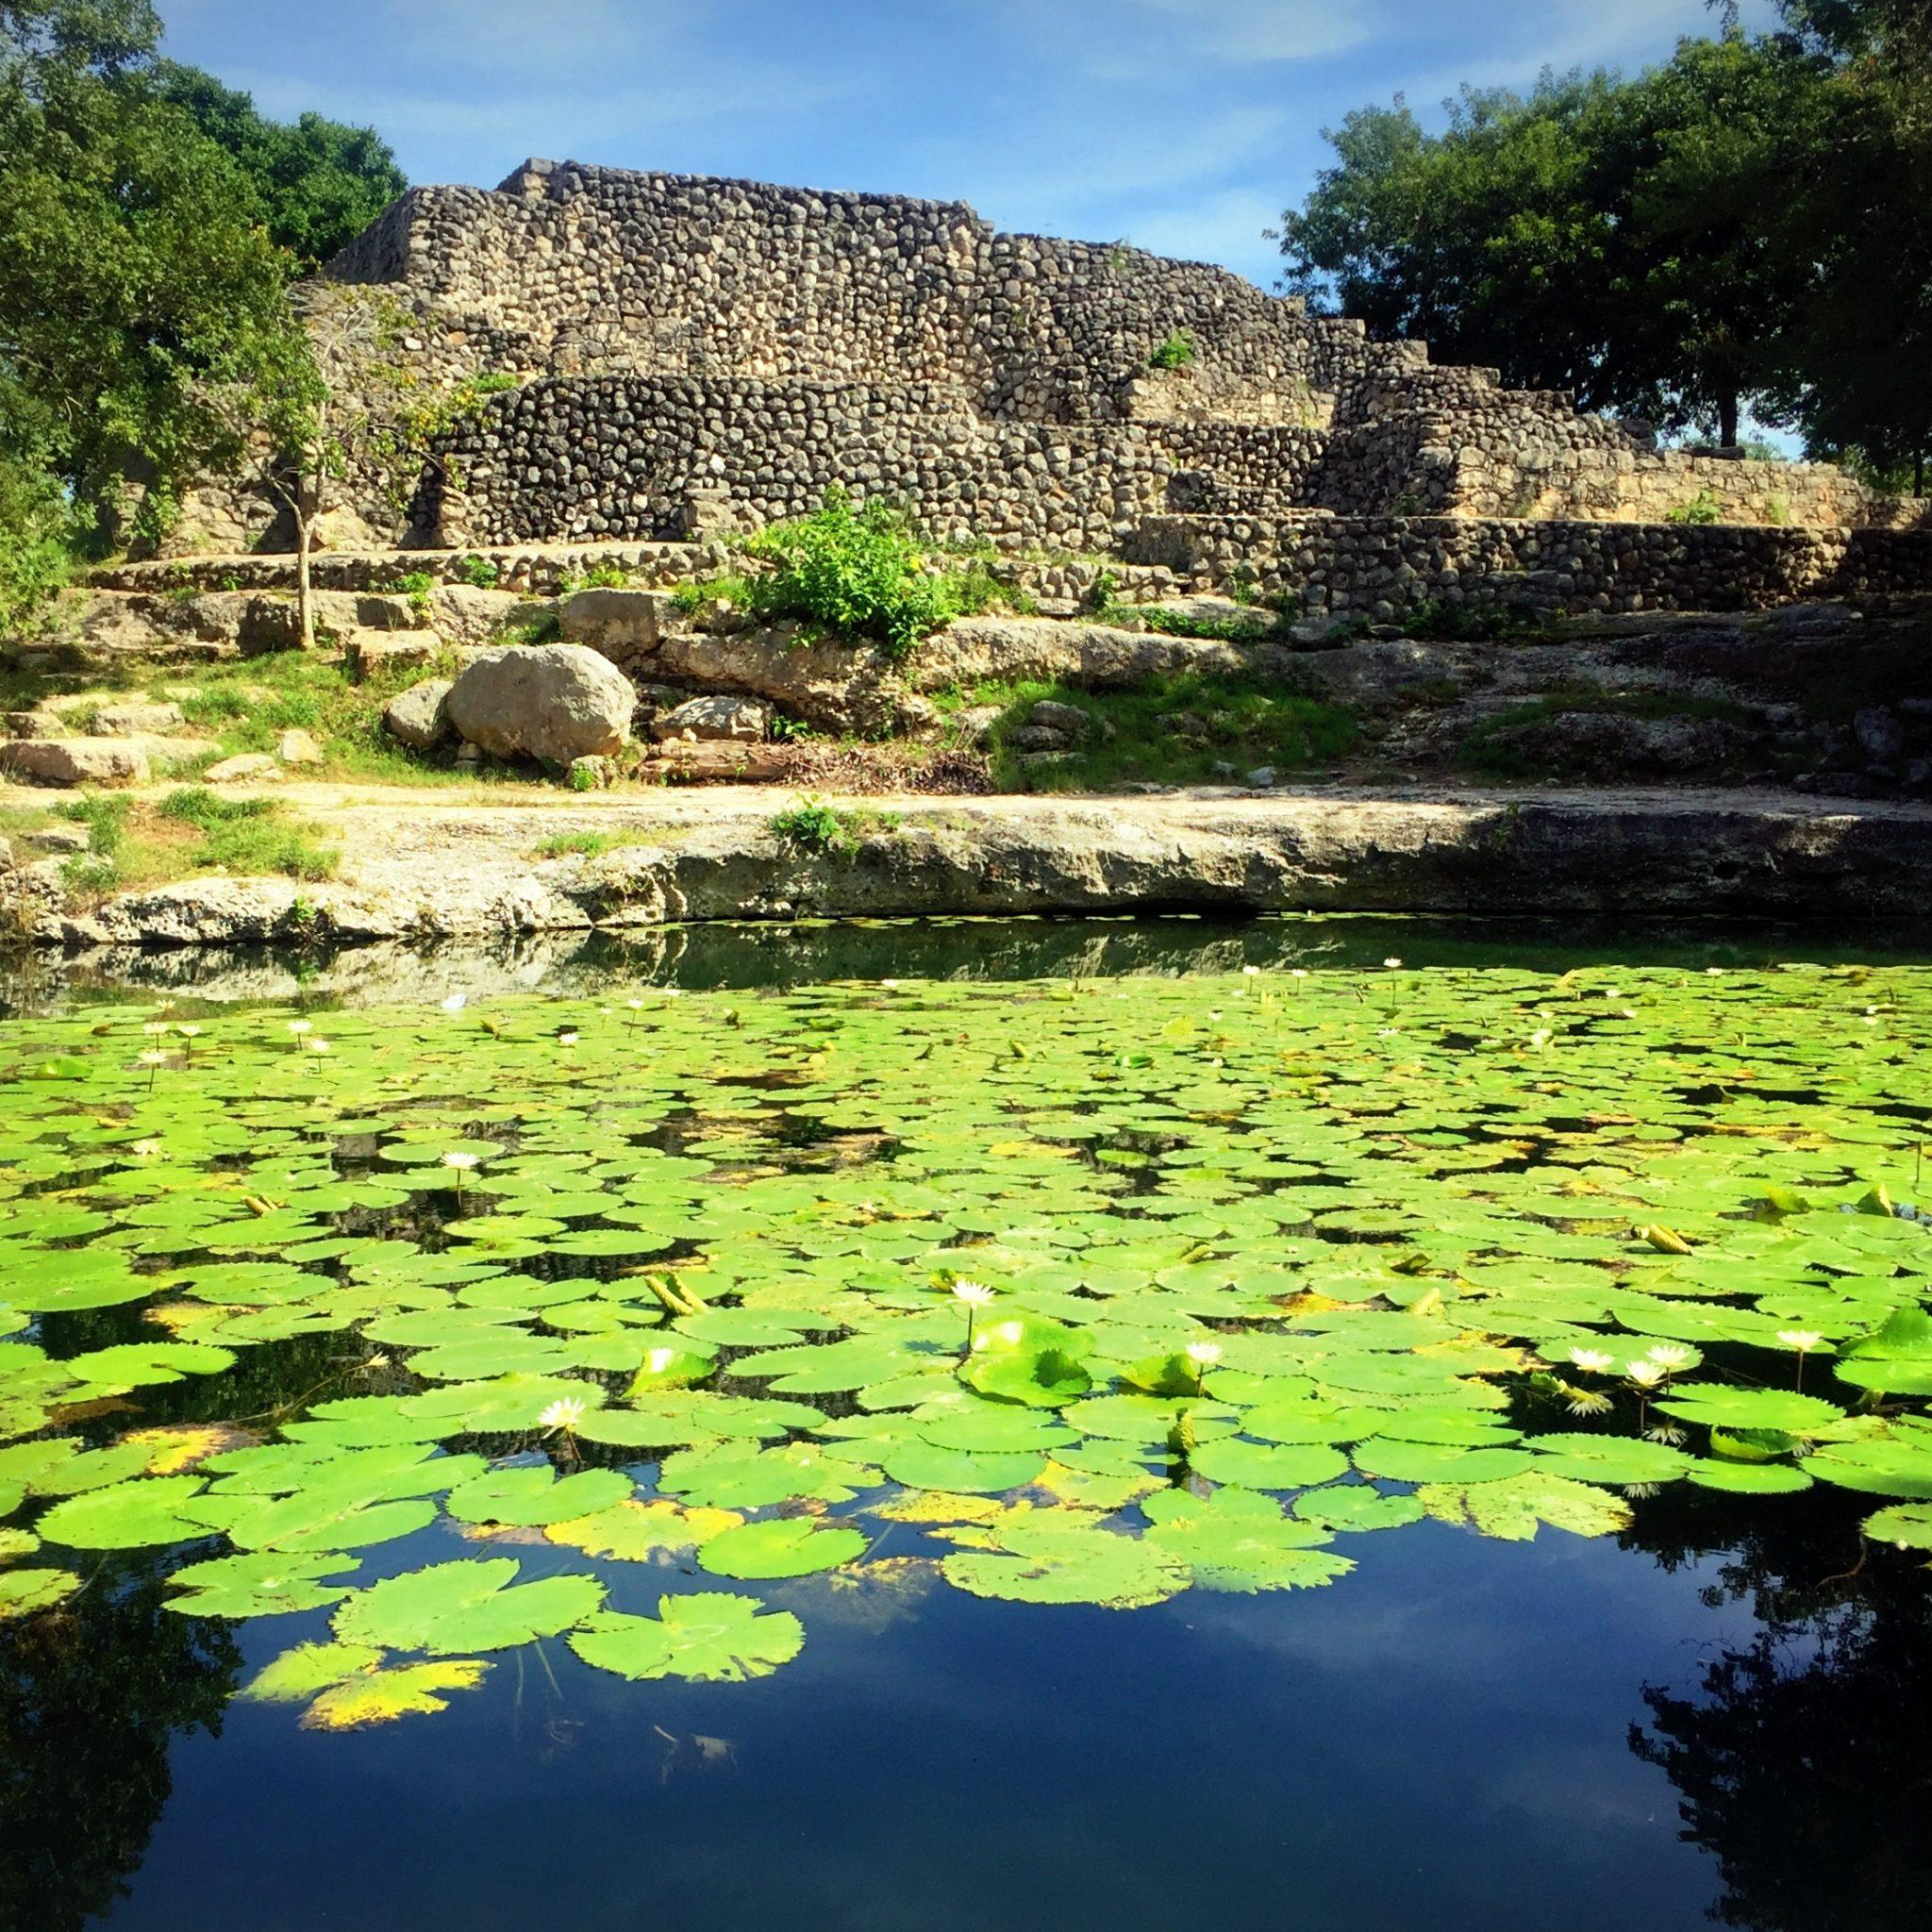 Swim among the waterlilies at Dzibilchaltún's cenotes.